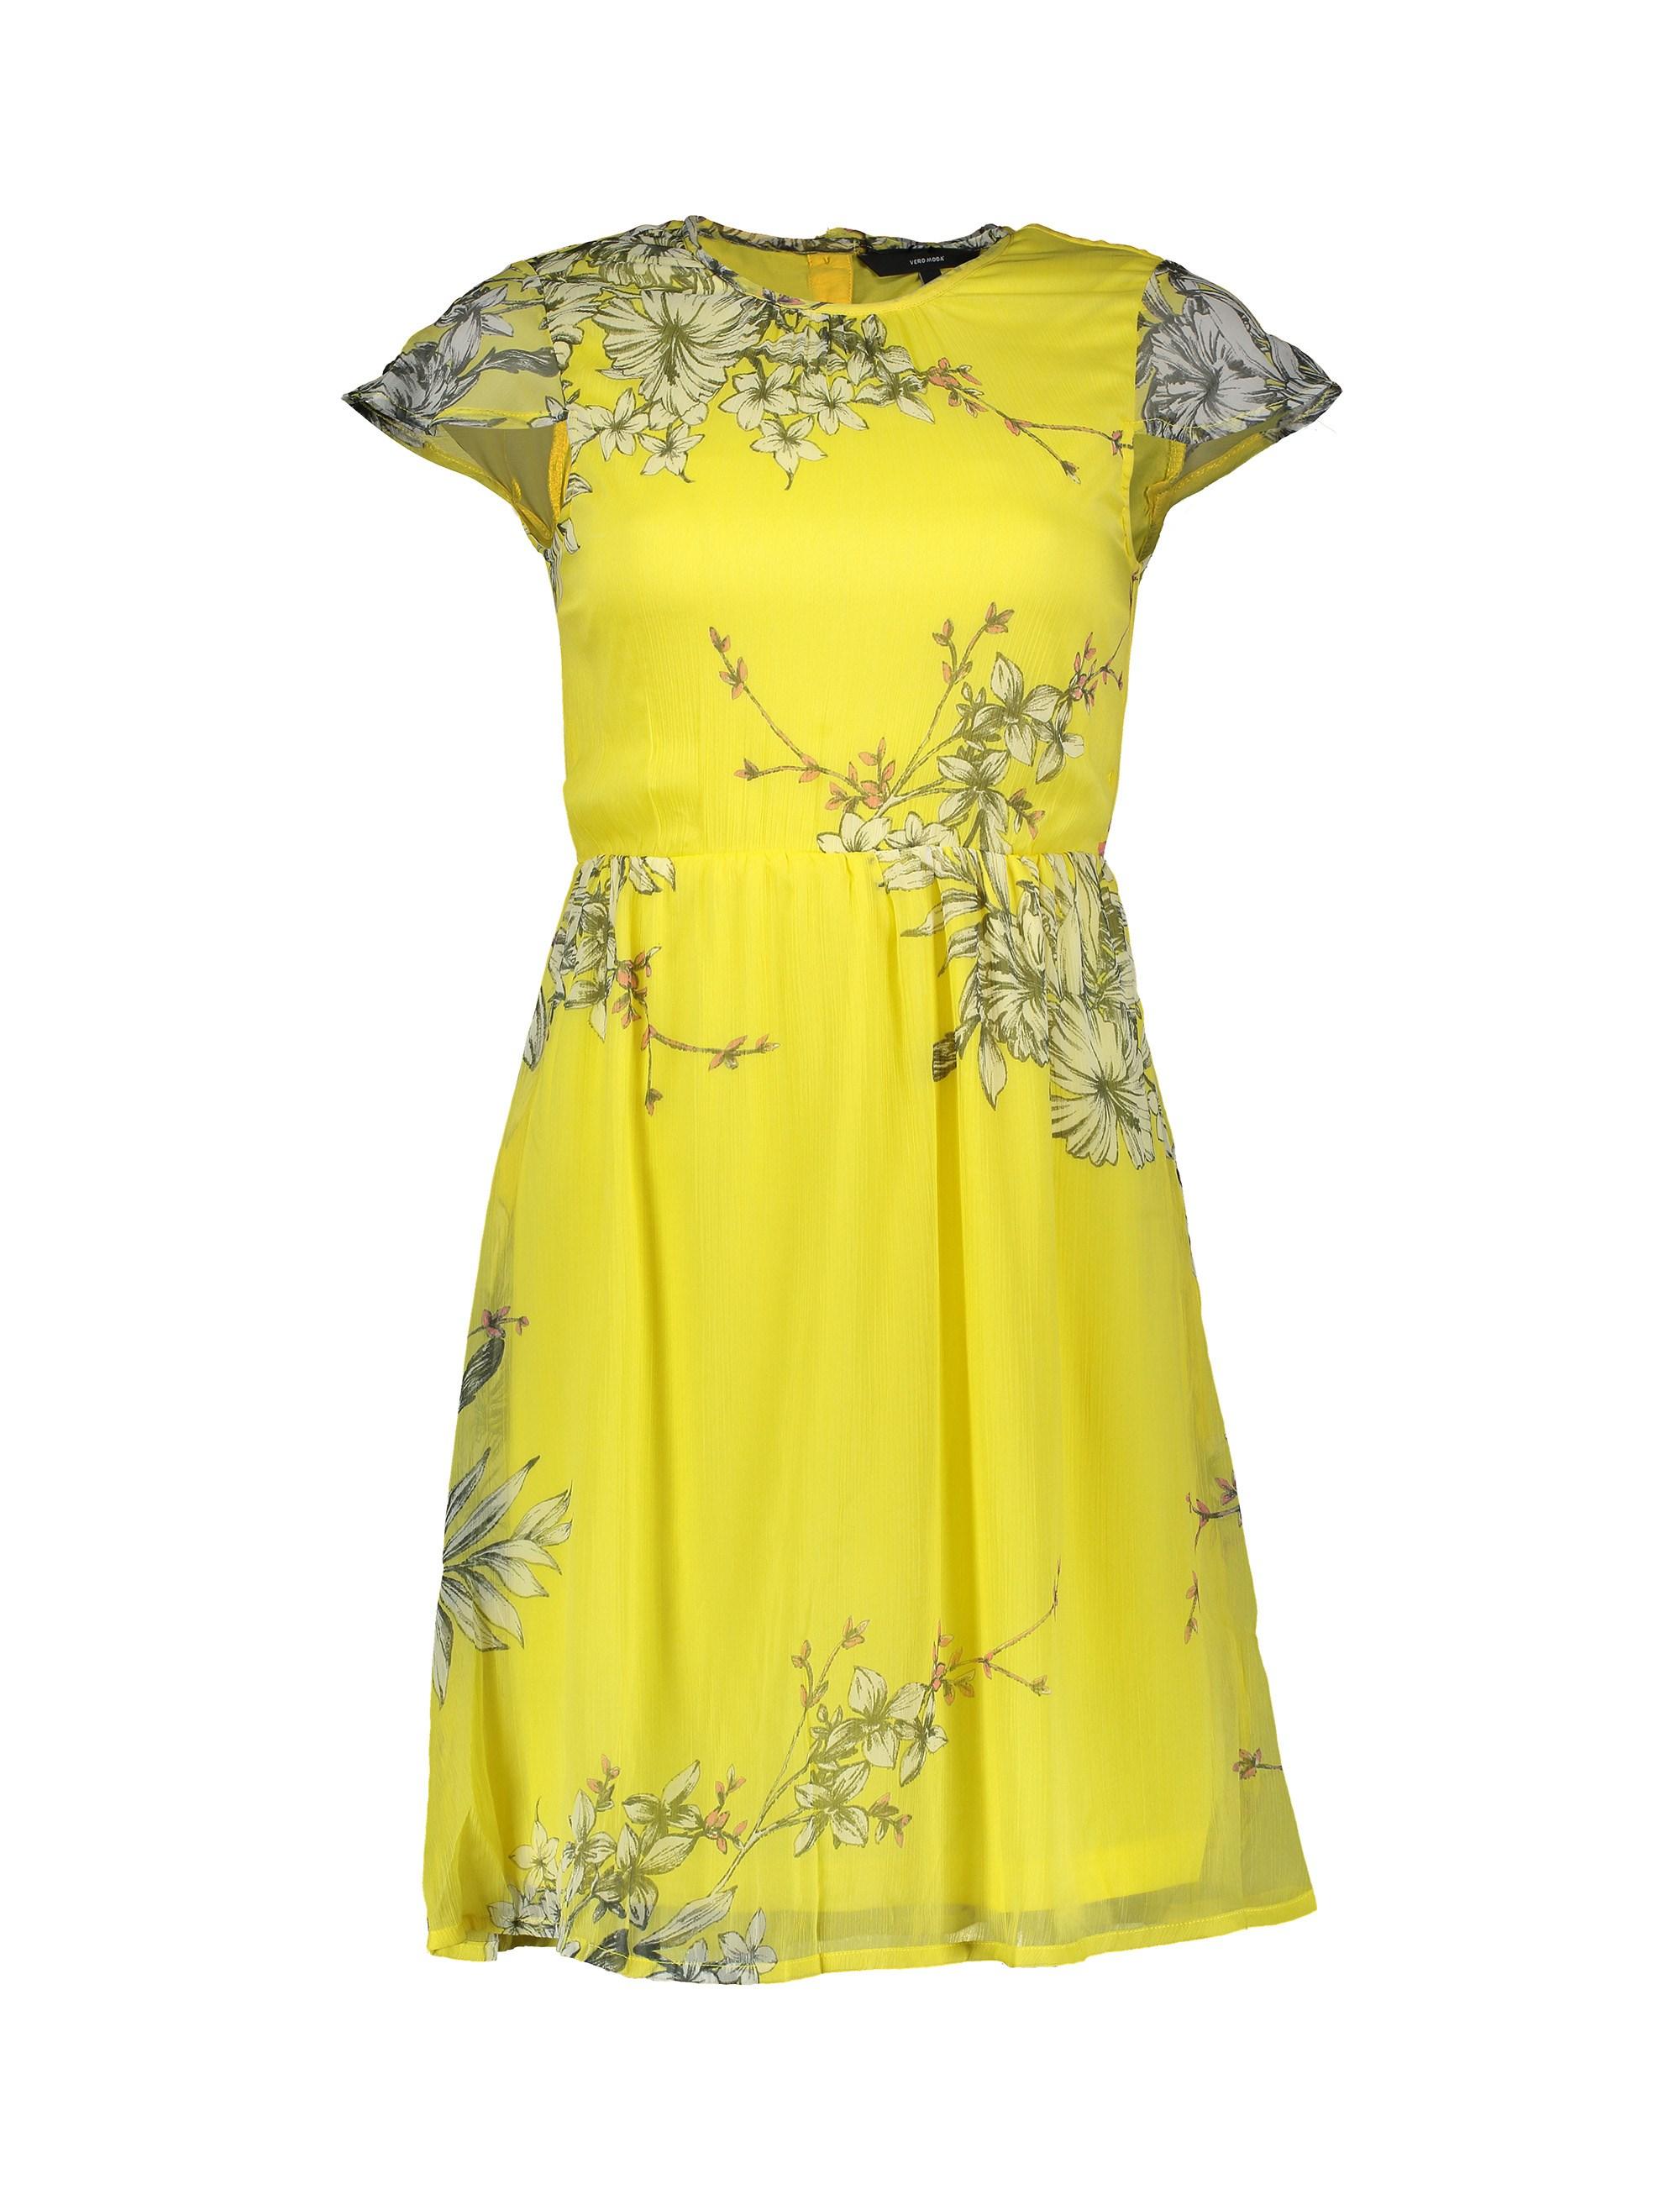 پیراهن کوتاه زنانه - ورو مدا - زرد - 1